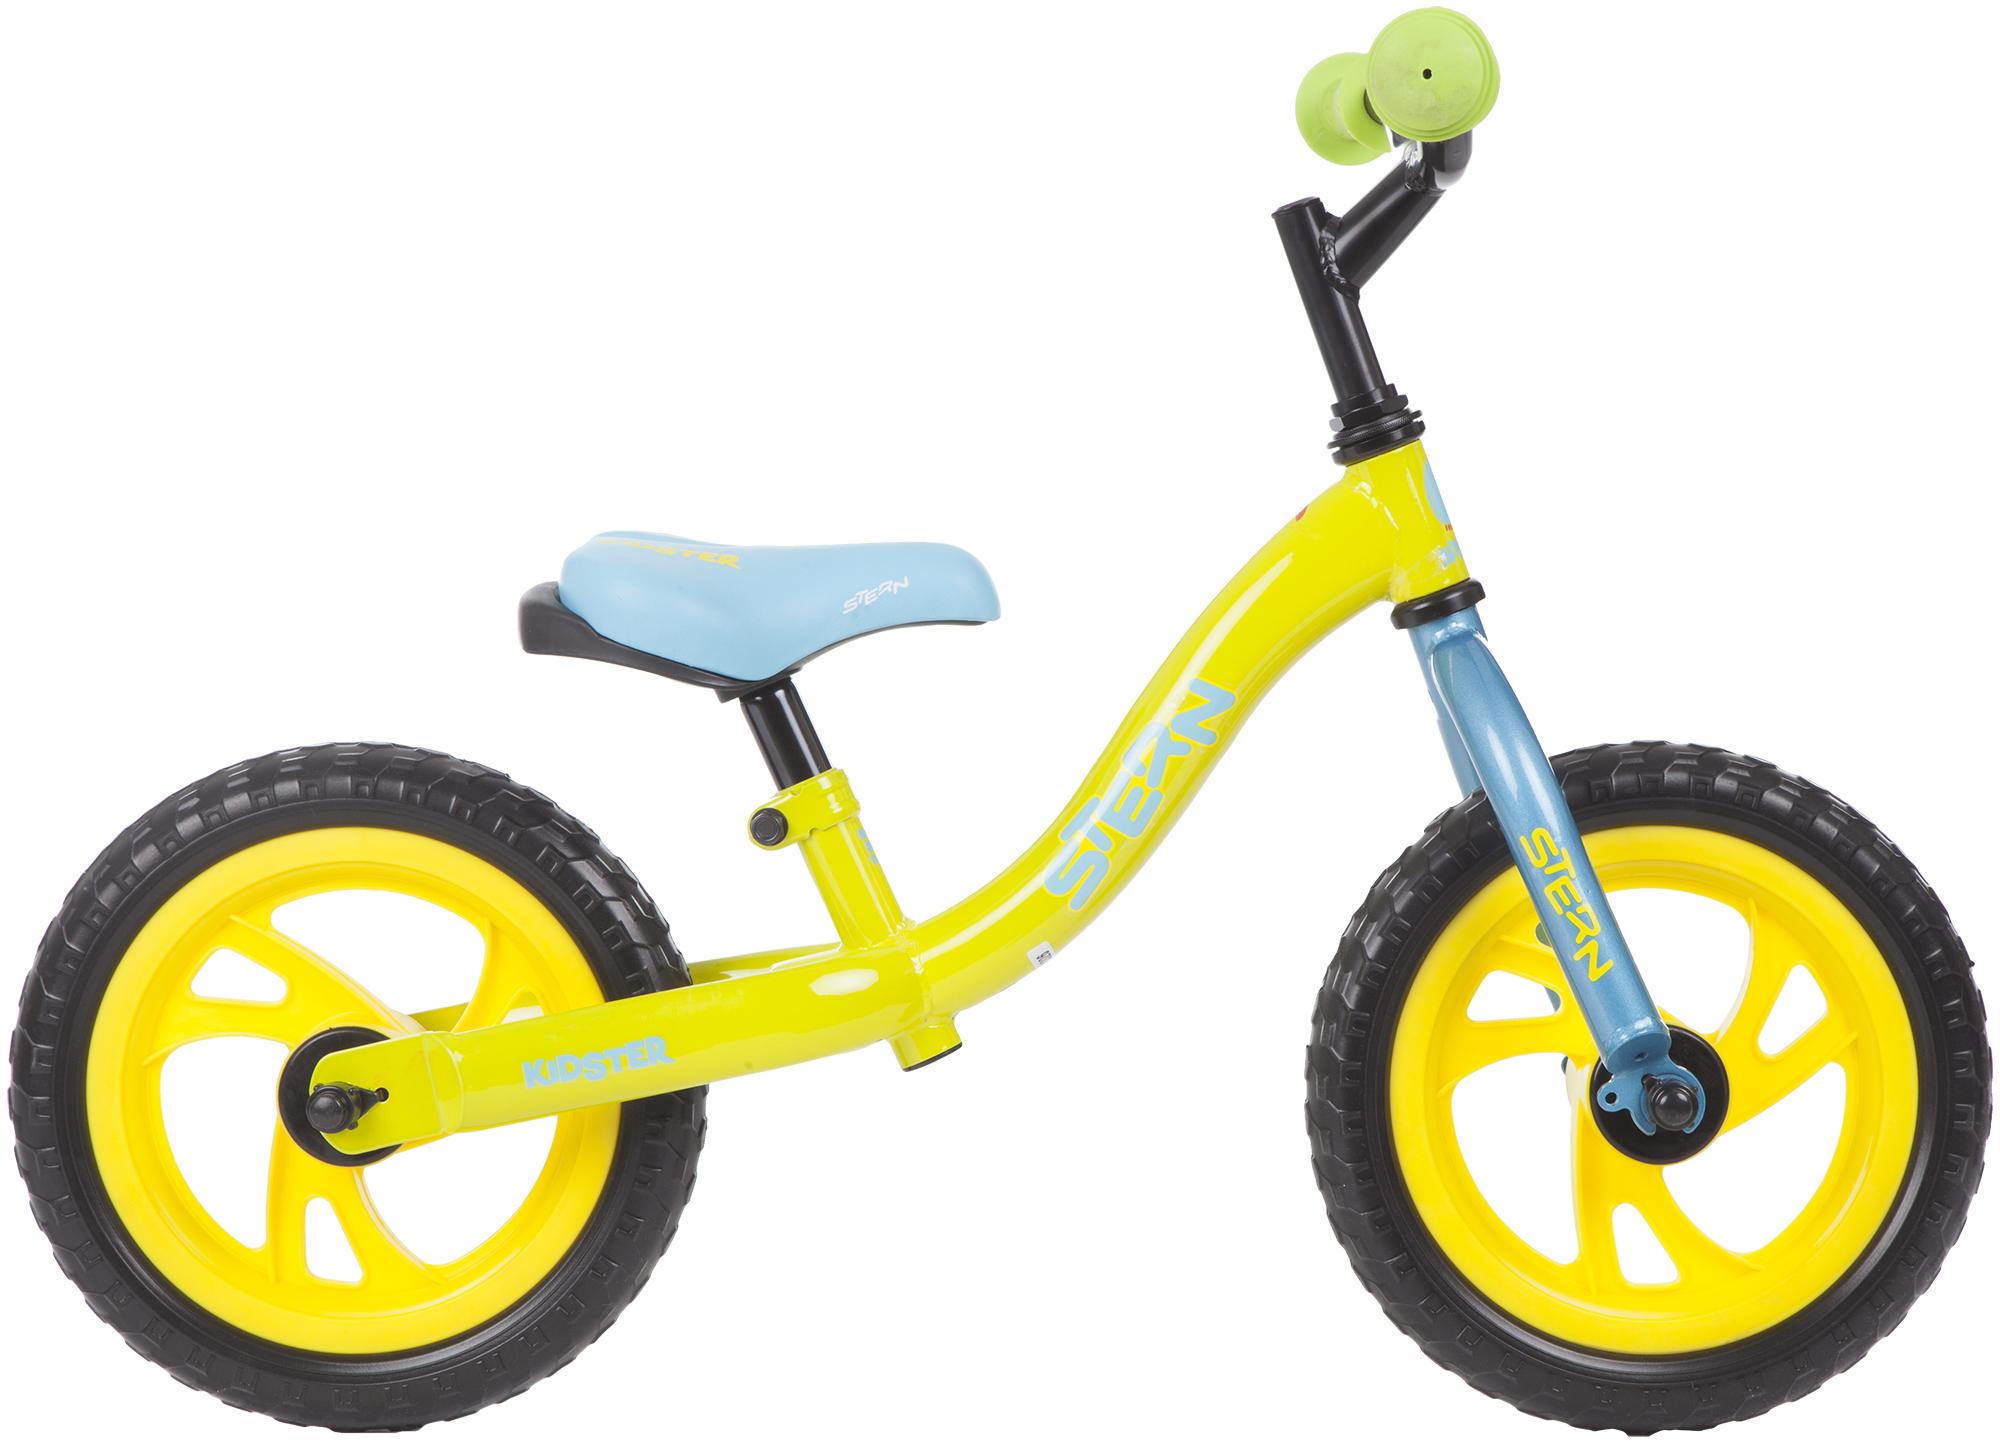 Stern Stern Kidster alt 12 (2017) stern велосипед горный stern motion 1 0 alt 27 5